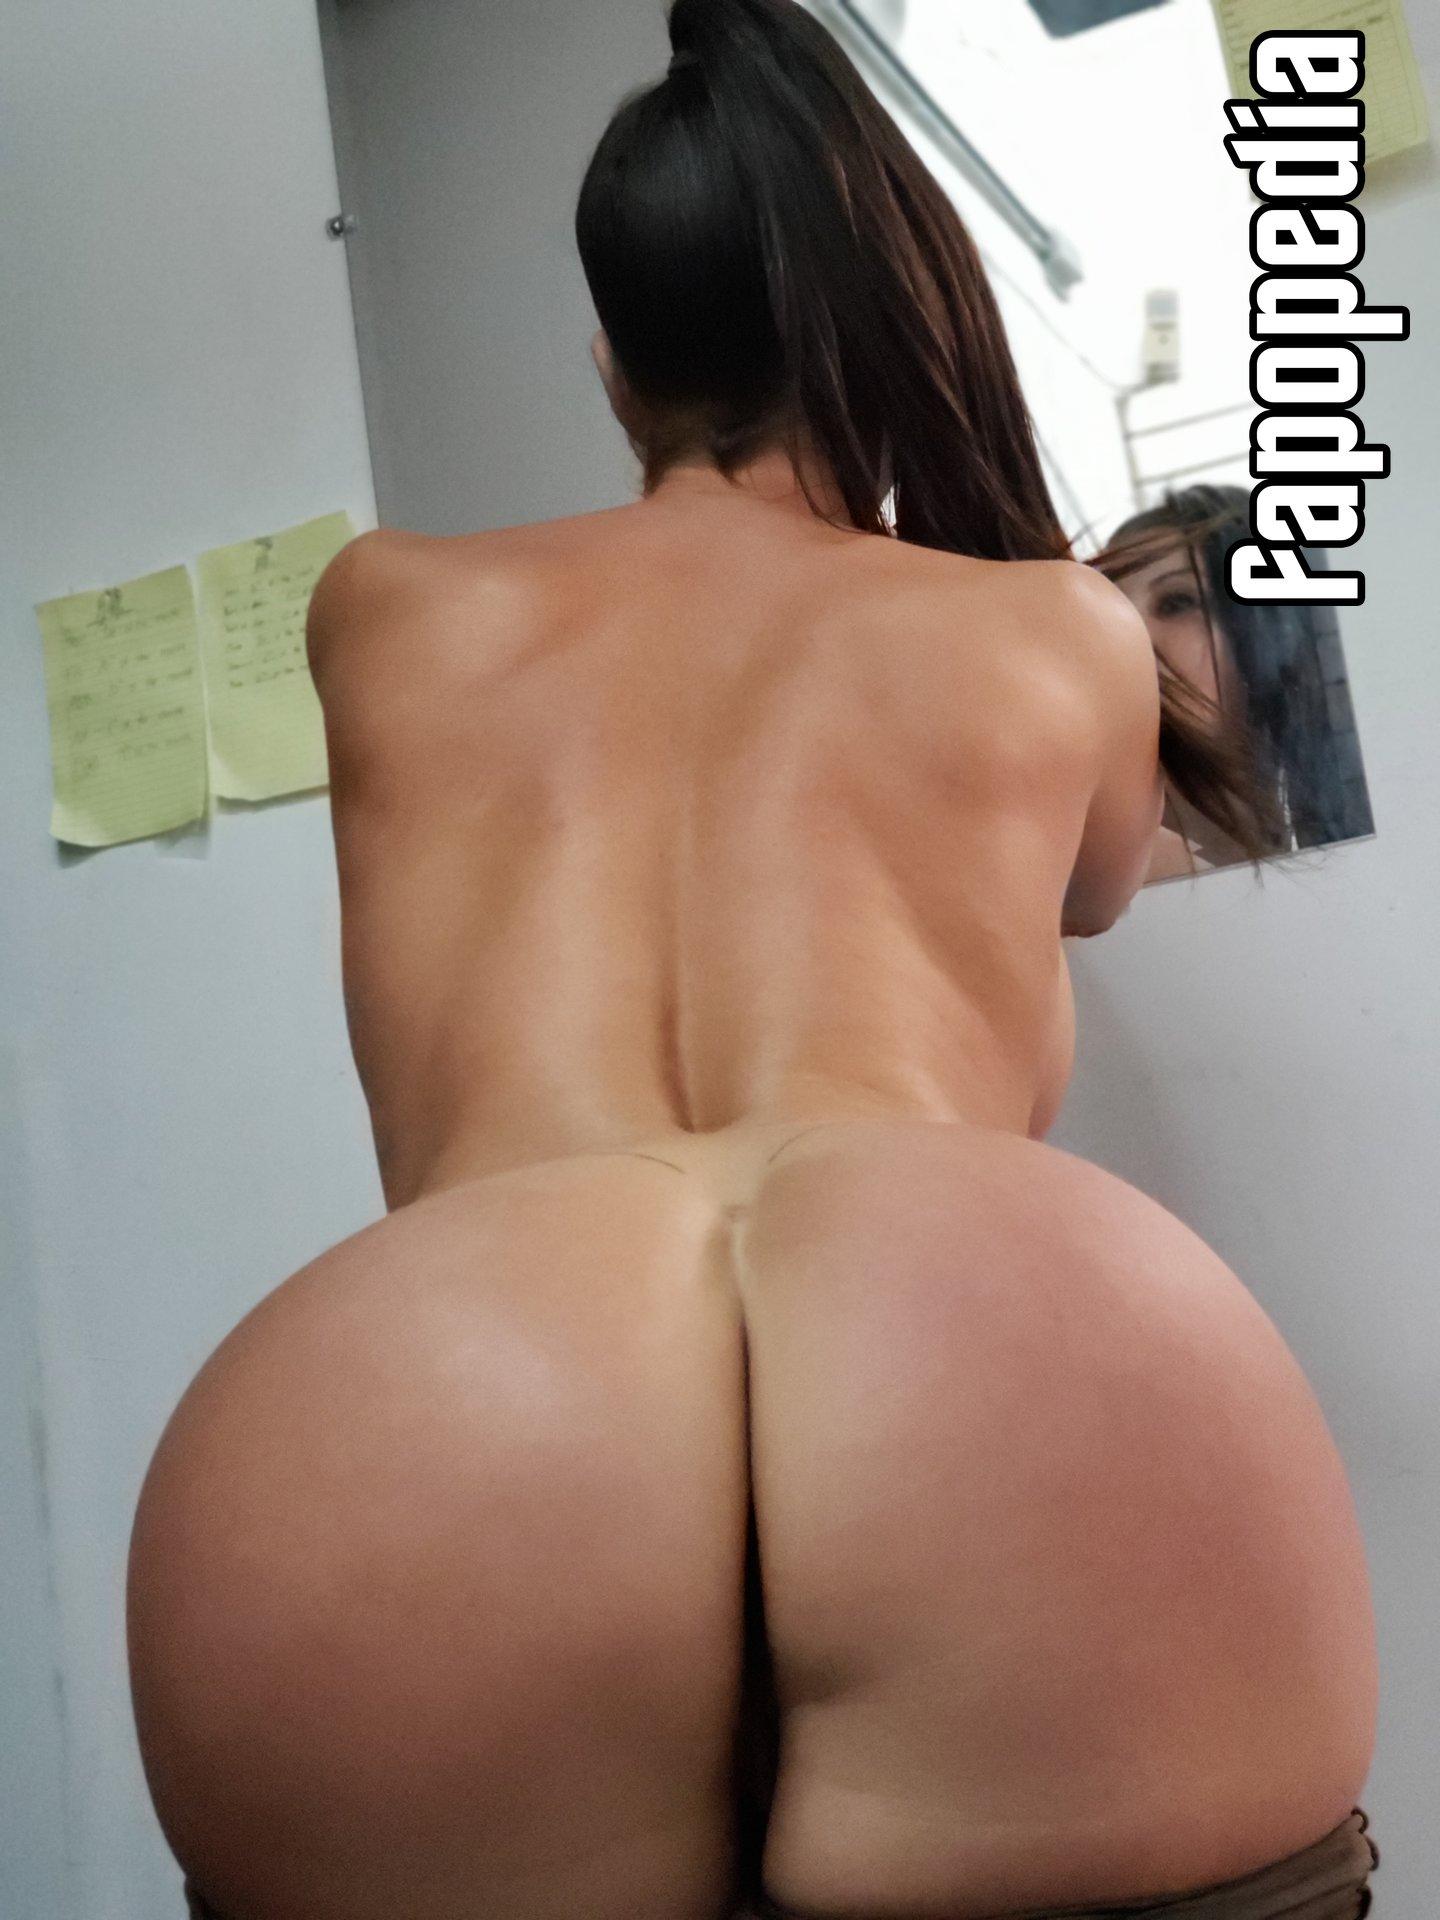 Bunny Grey Nude OnlyFans Leaks - Photo #46779 - Fapopedia